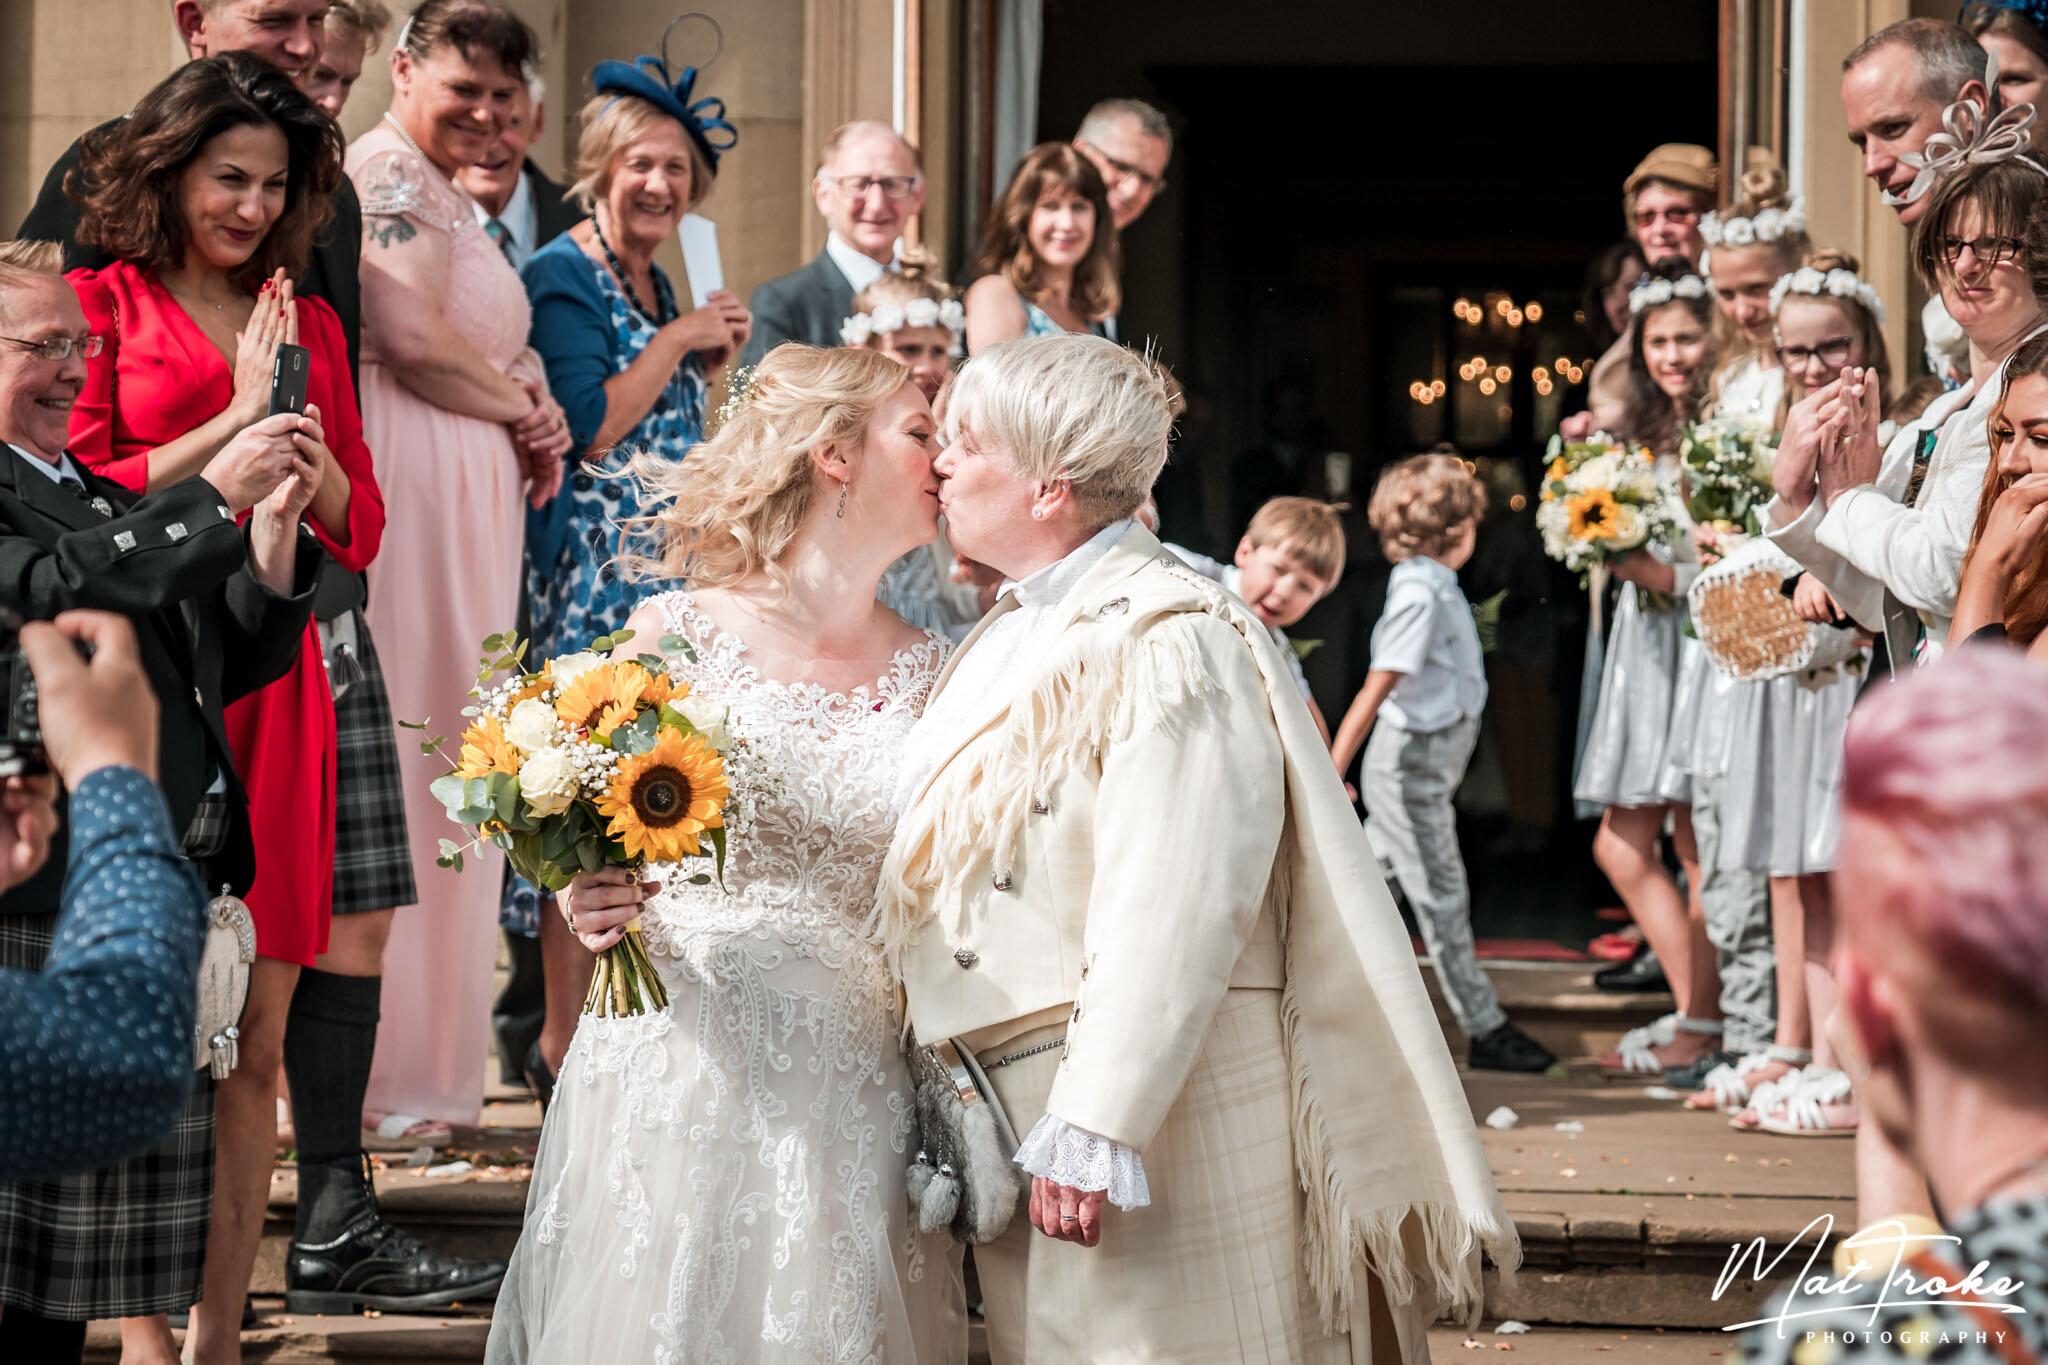 wortley-hall-ceremony-two-brides-beautiful-wedding-photographer